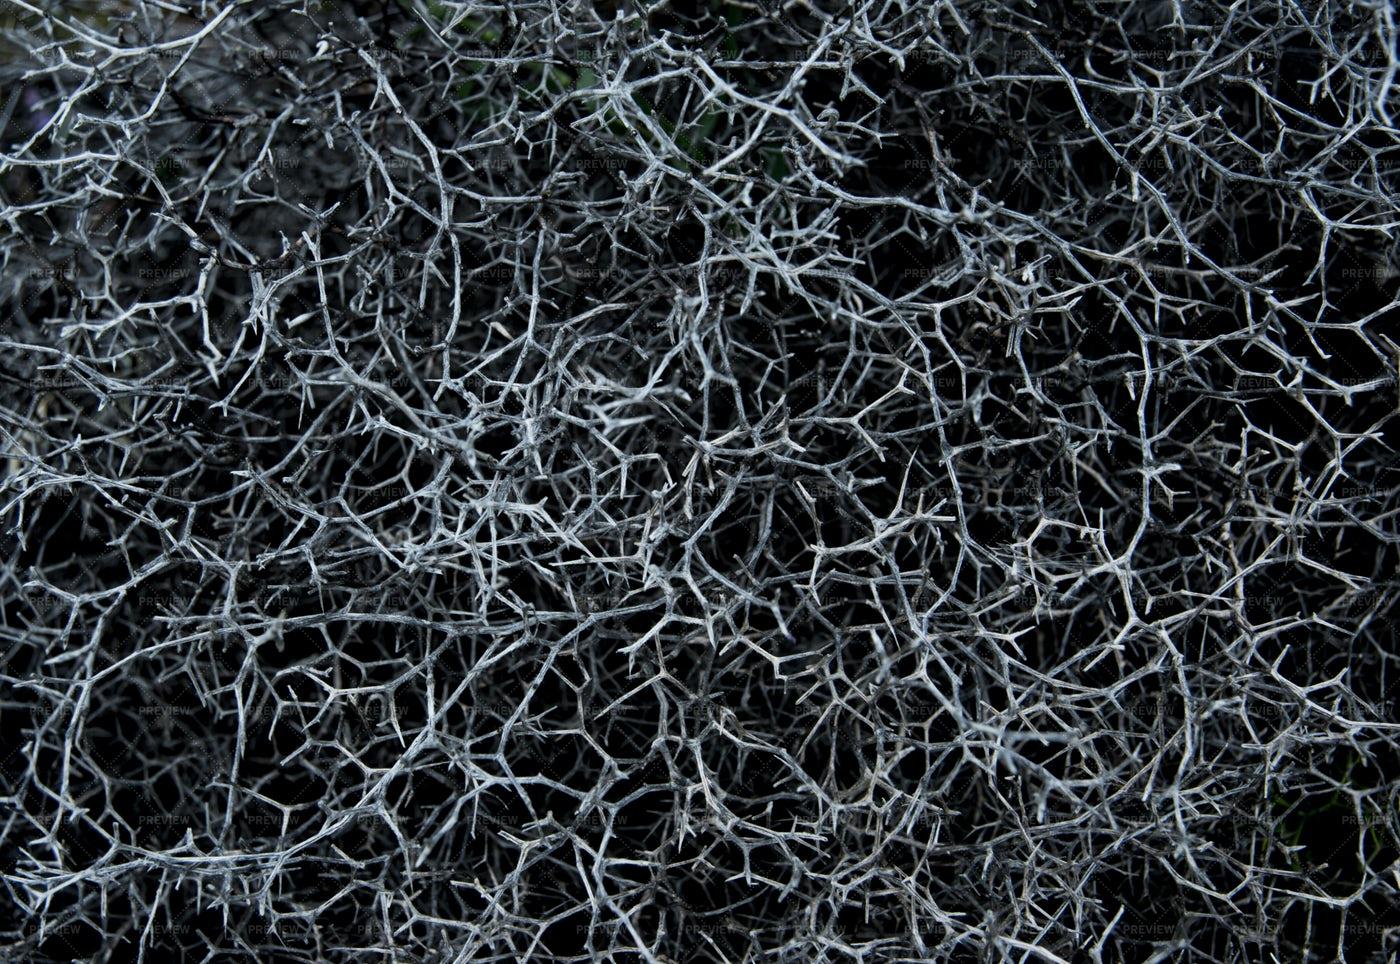 Dark Dry Branches Texture: Stock Photos